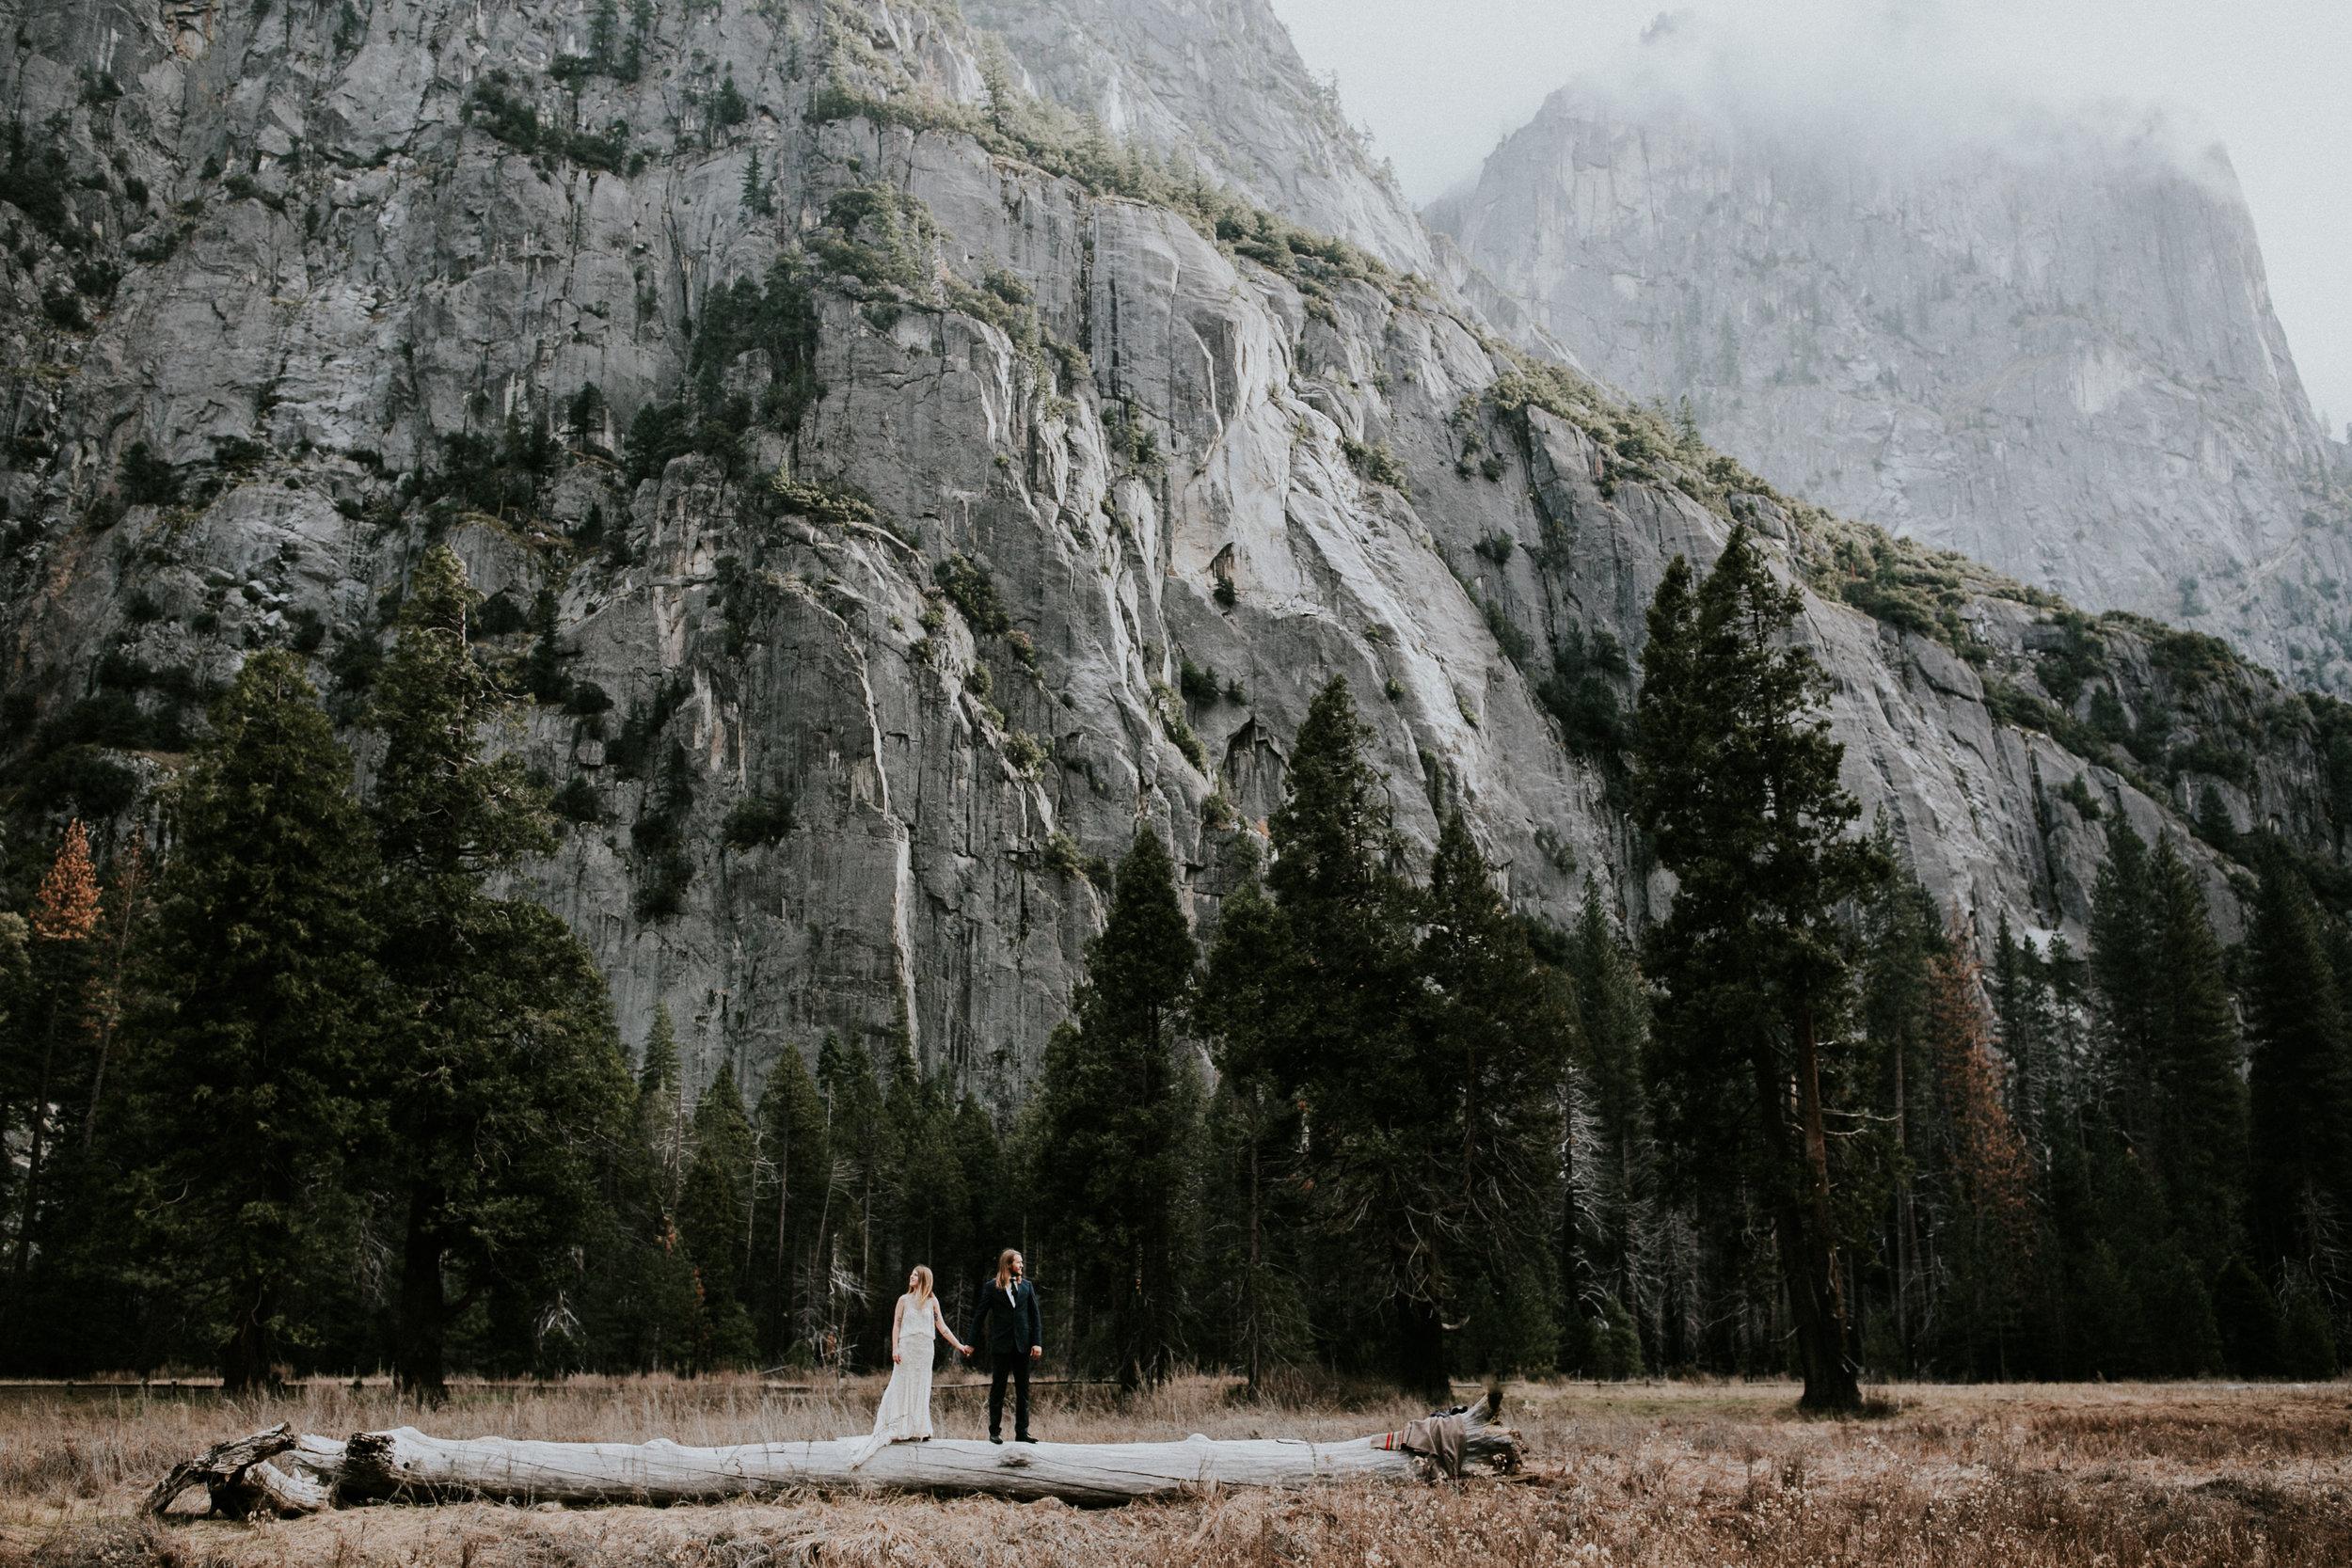 adventure-california-yosemite-photographer-grace-t-photography-84.jpg